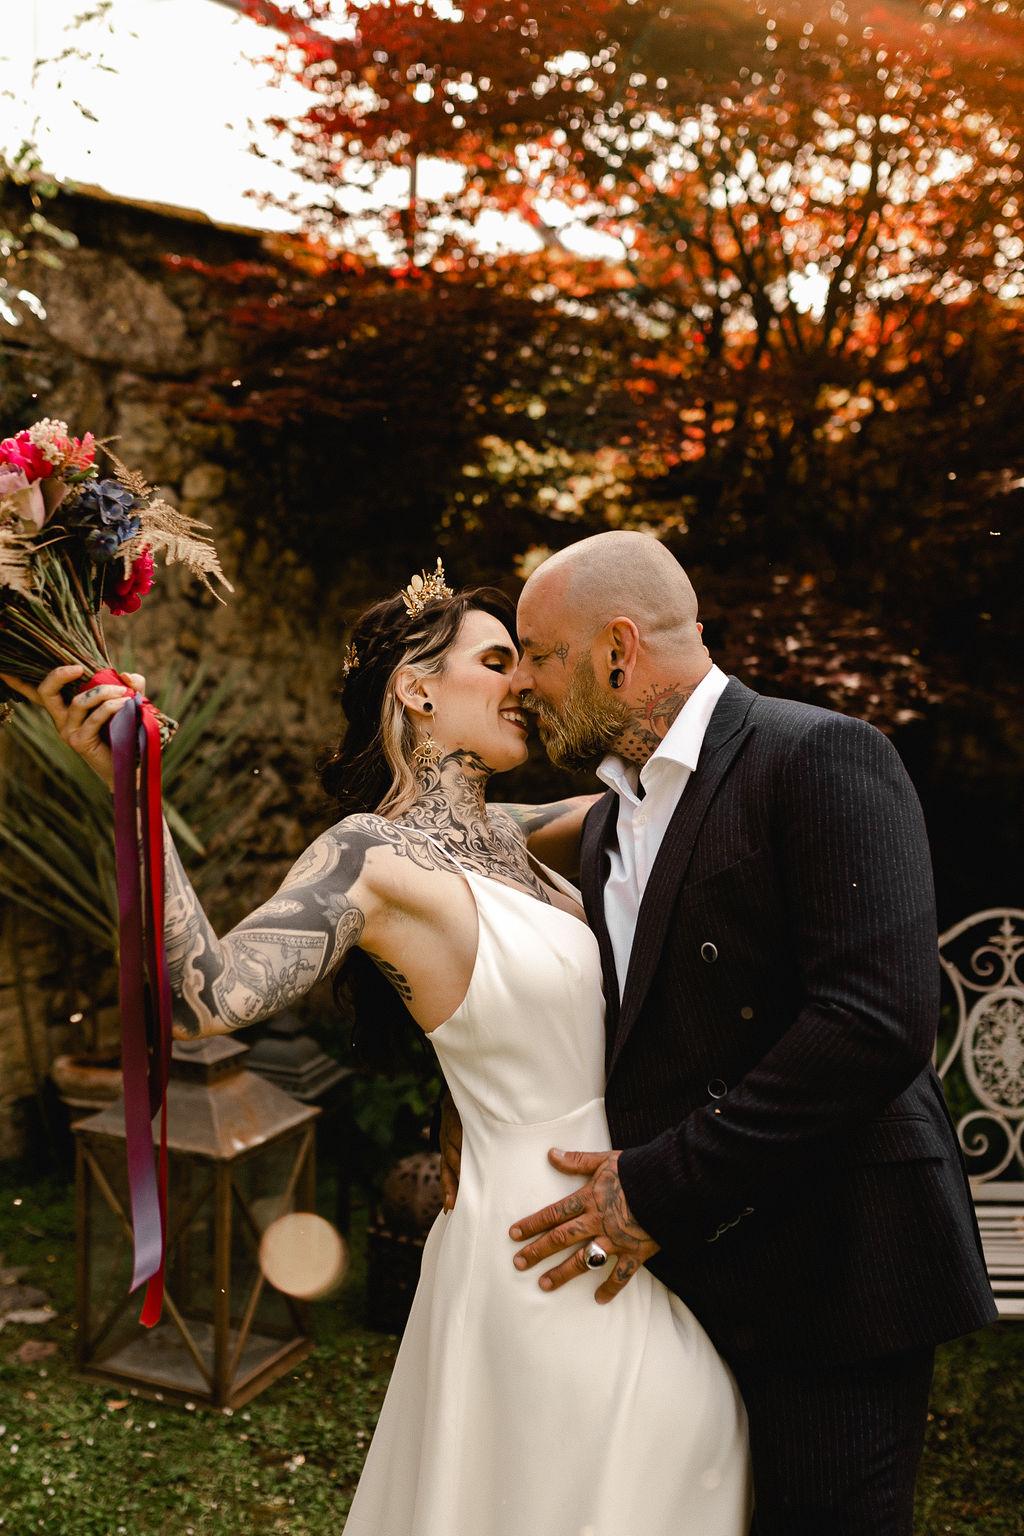 autumn wedding - alternative wedding inspiration - unconventional wedding